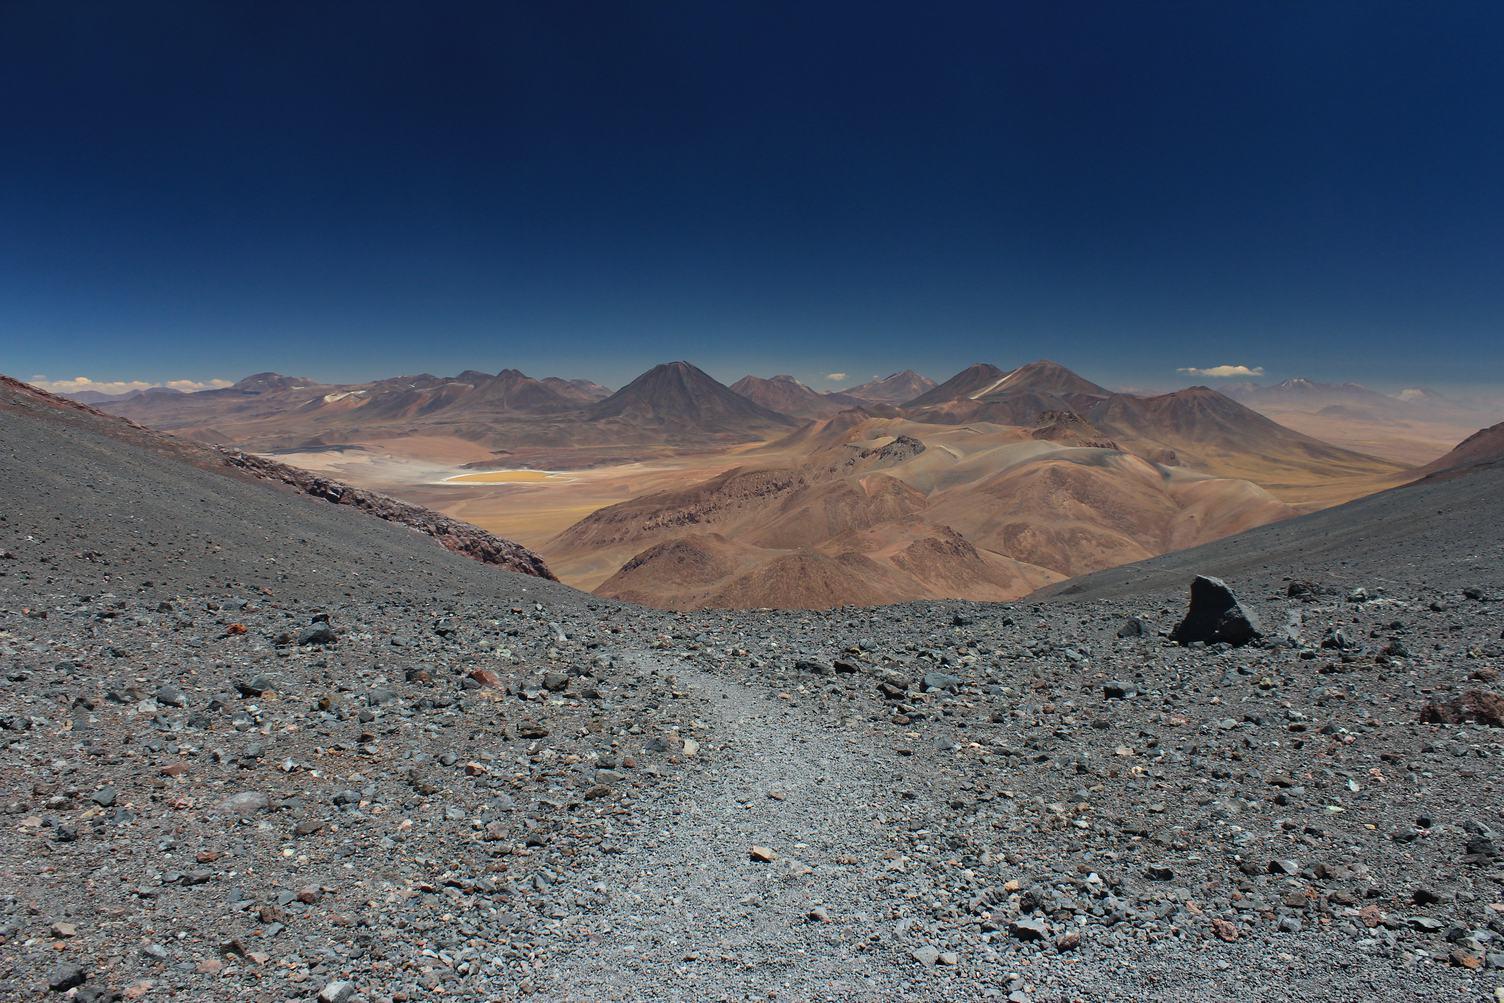 Desert Landscape of Atacama, Chile